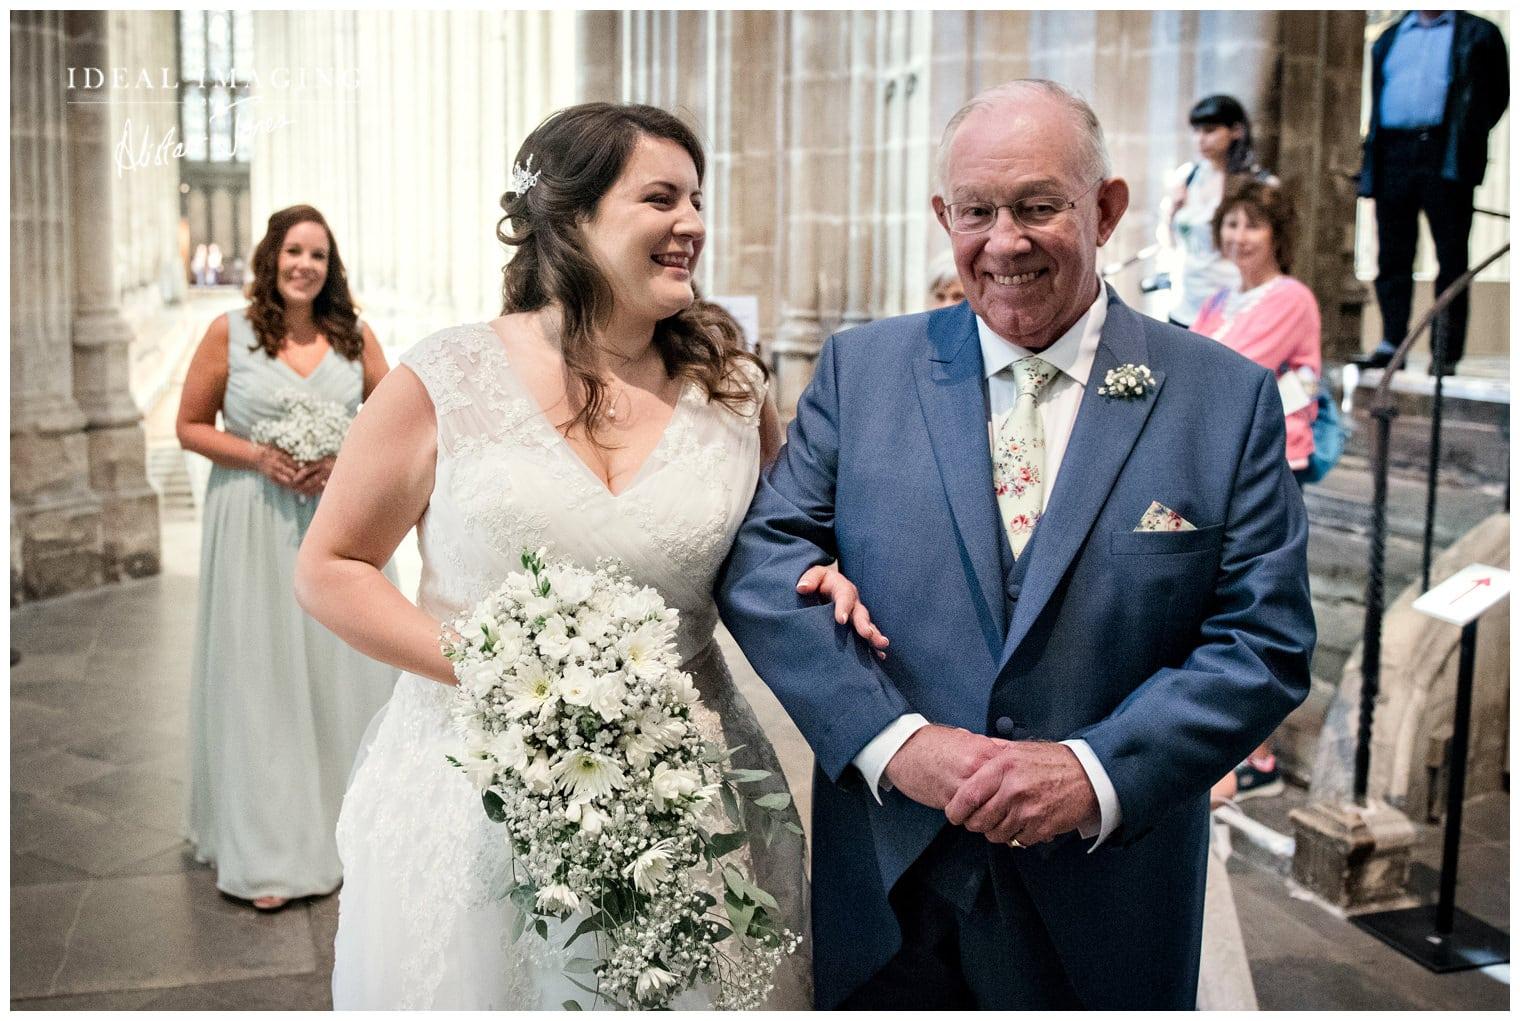 canterbury_cathedral_wedding-054